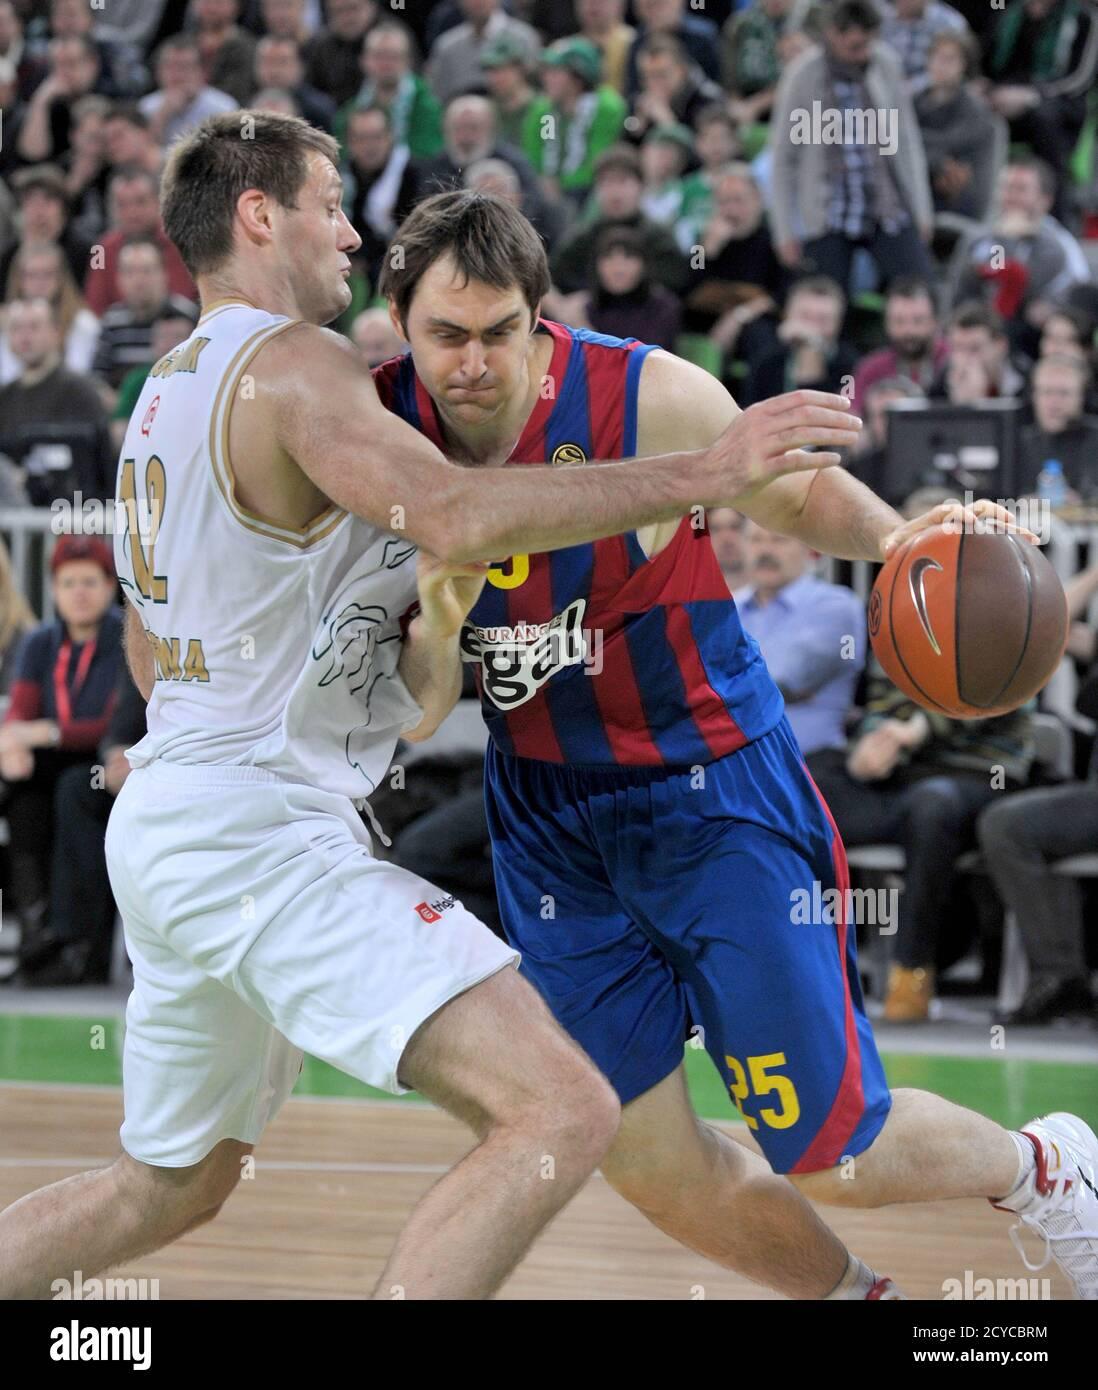 Goran Jagodnik of Union Olimpija  challenges Erazem Lorbek  (R) of Regal Barcelona during their men's Euroleague basketball group B game  in Ljubljana Janurary 27, 2011. REUTERS/ISrdjan Zivulovic (SLOVENIA - Tags: SPORT BASKETBALL) Banque D'Images